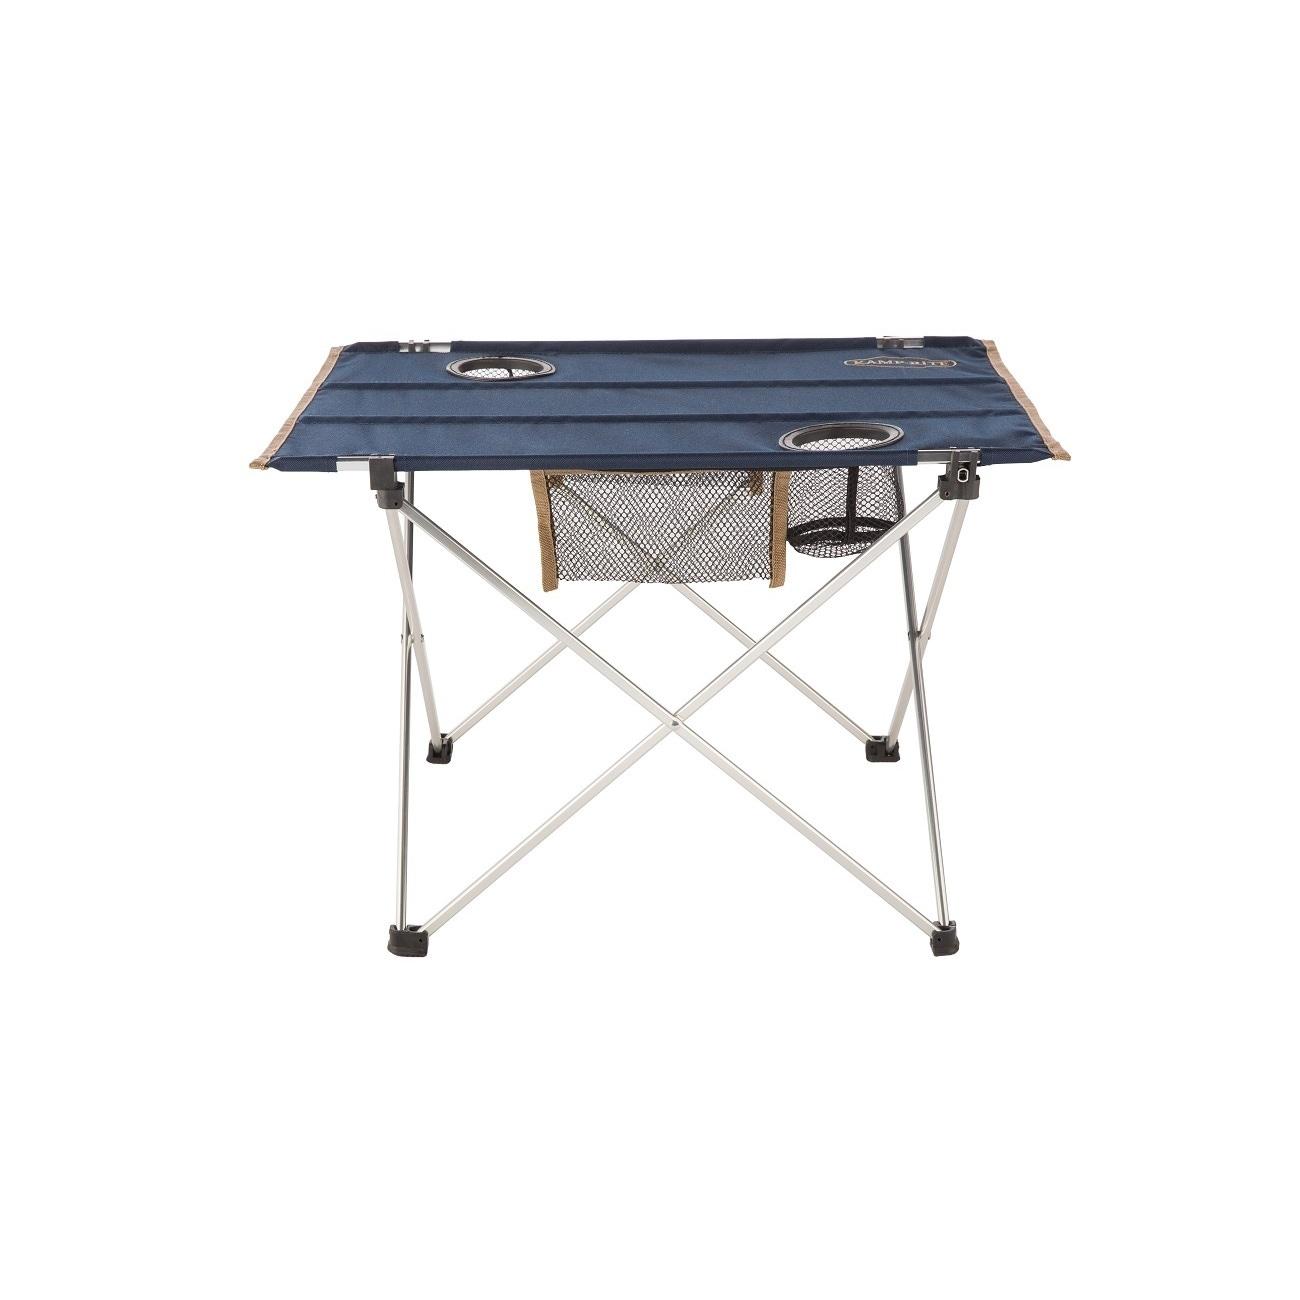 Kamp-Rite Kamp Rite Blue Ultra Lite Table (Ultra Lite Table)